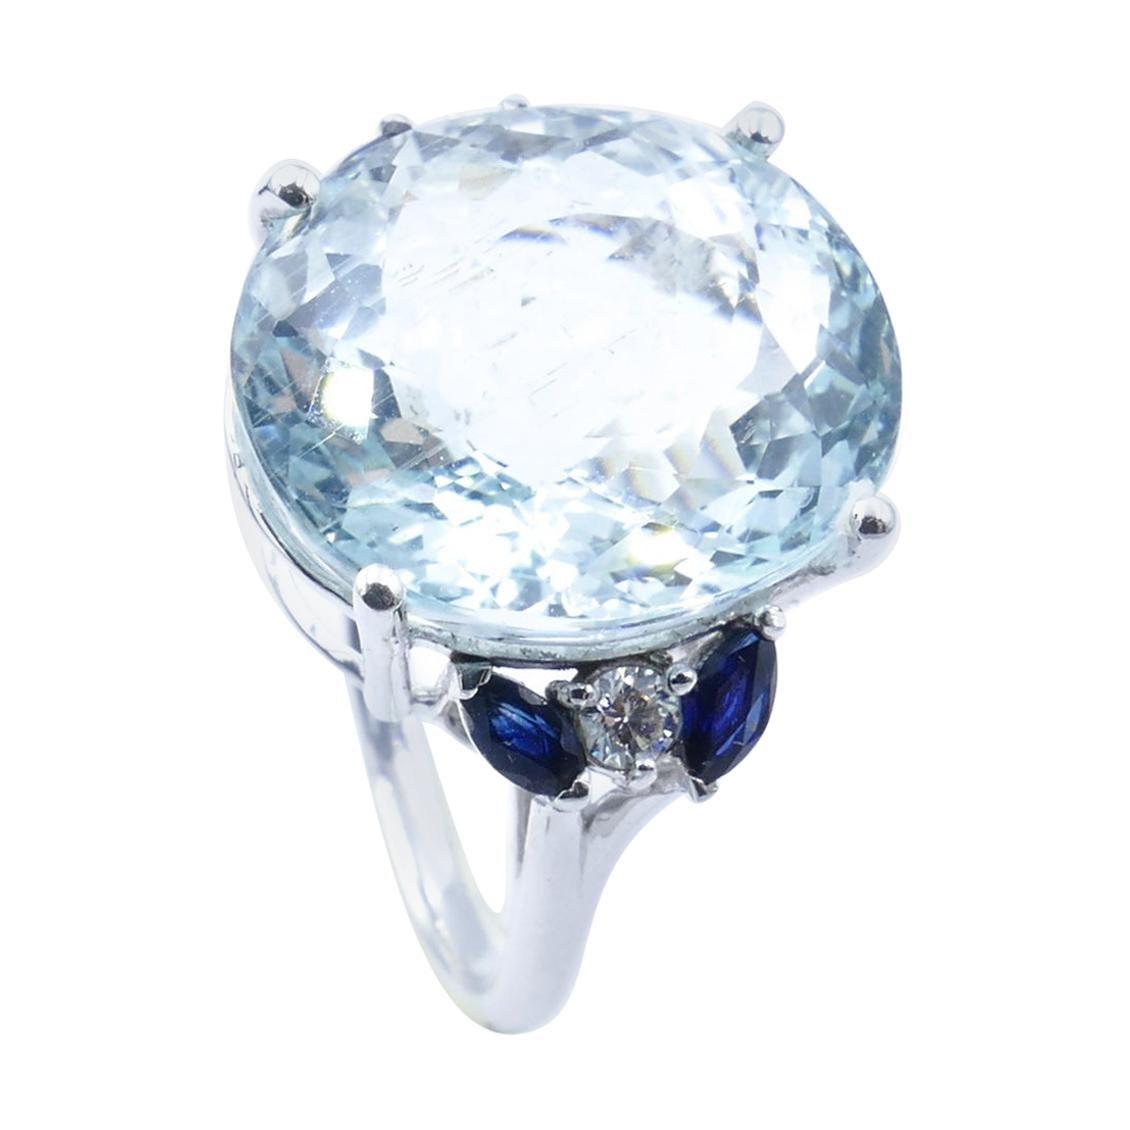 18ct White Gold, Aquamarine, Blue Sapphire & Diamond Cocktail Ring